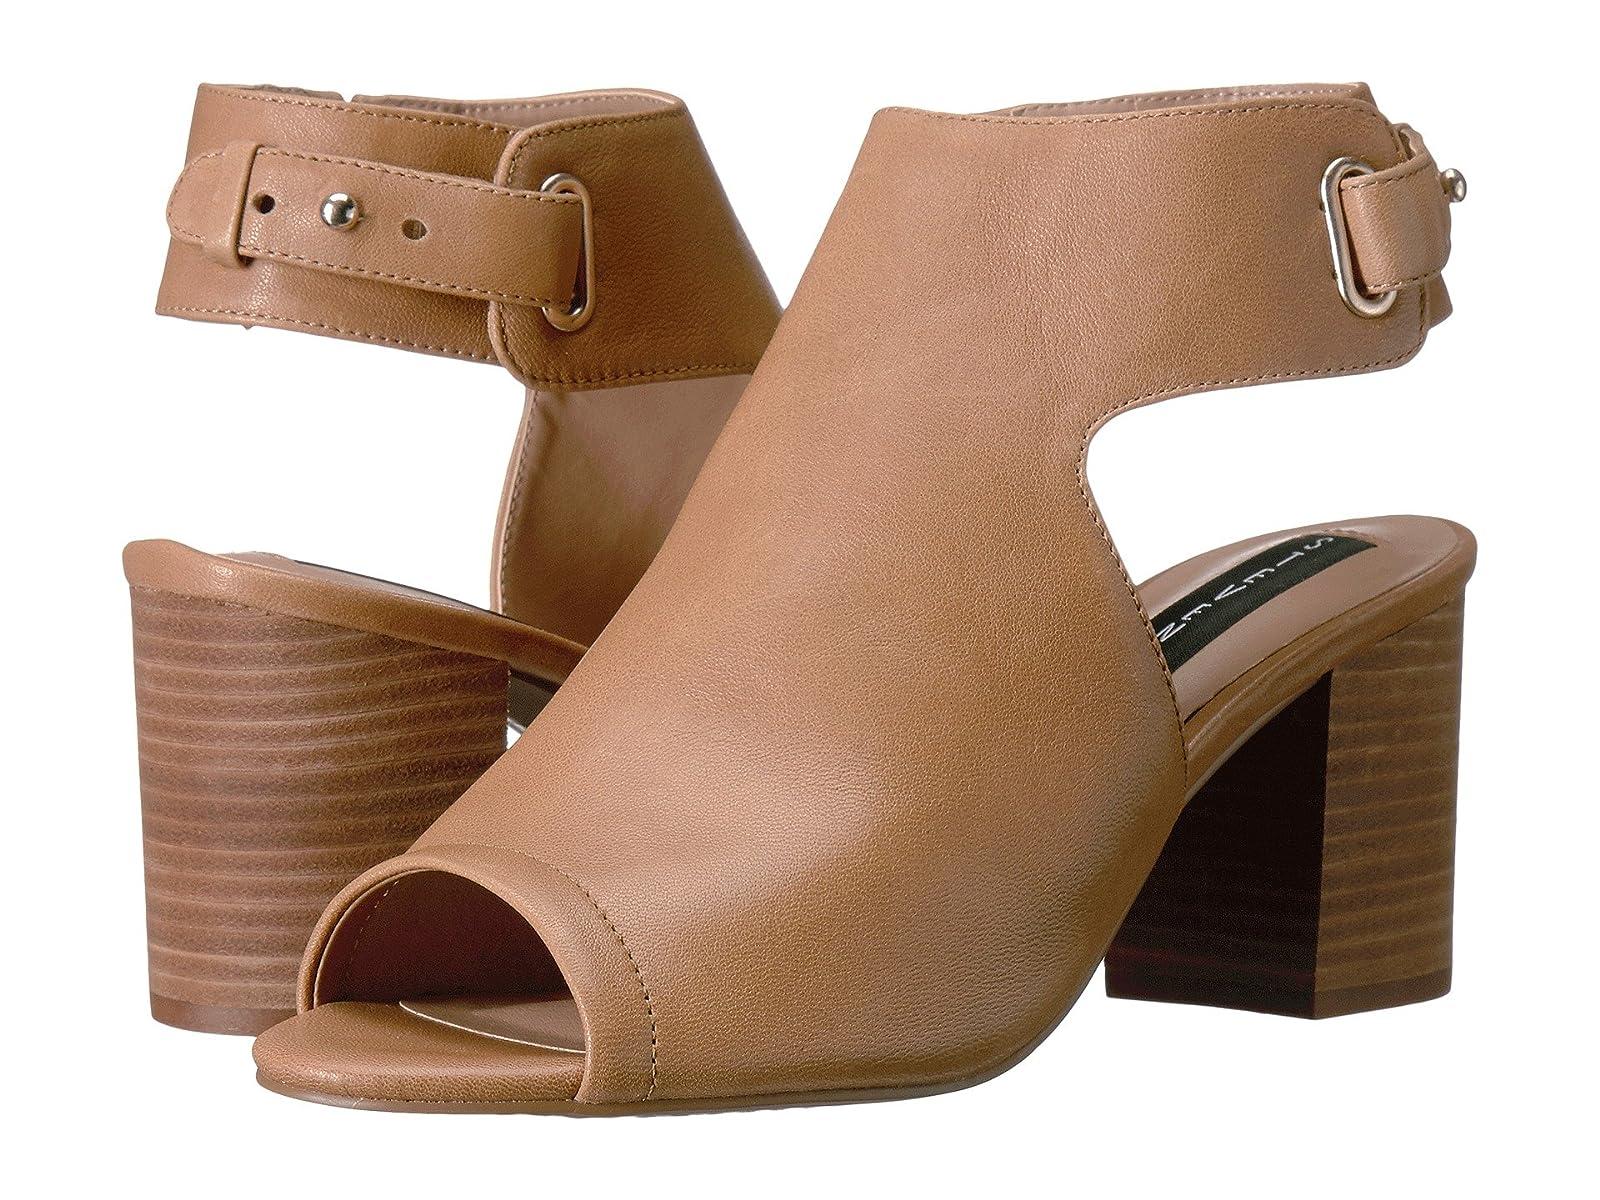 Steven VenuzCheap and distinctive eye-catching shoes